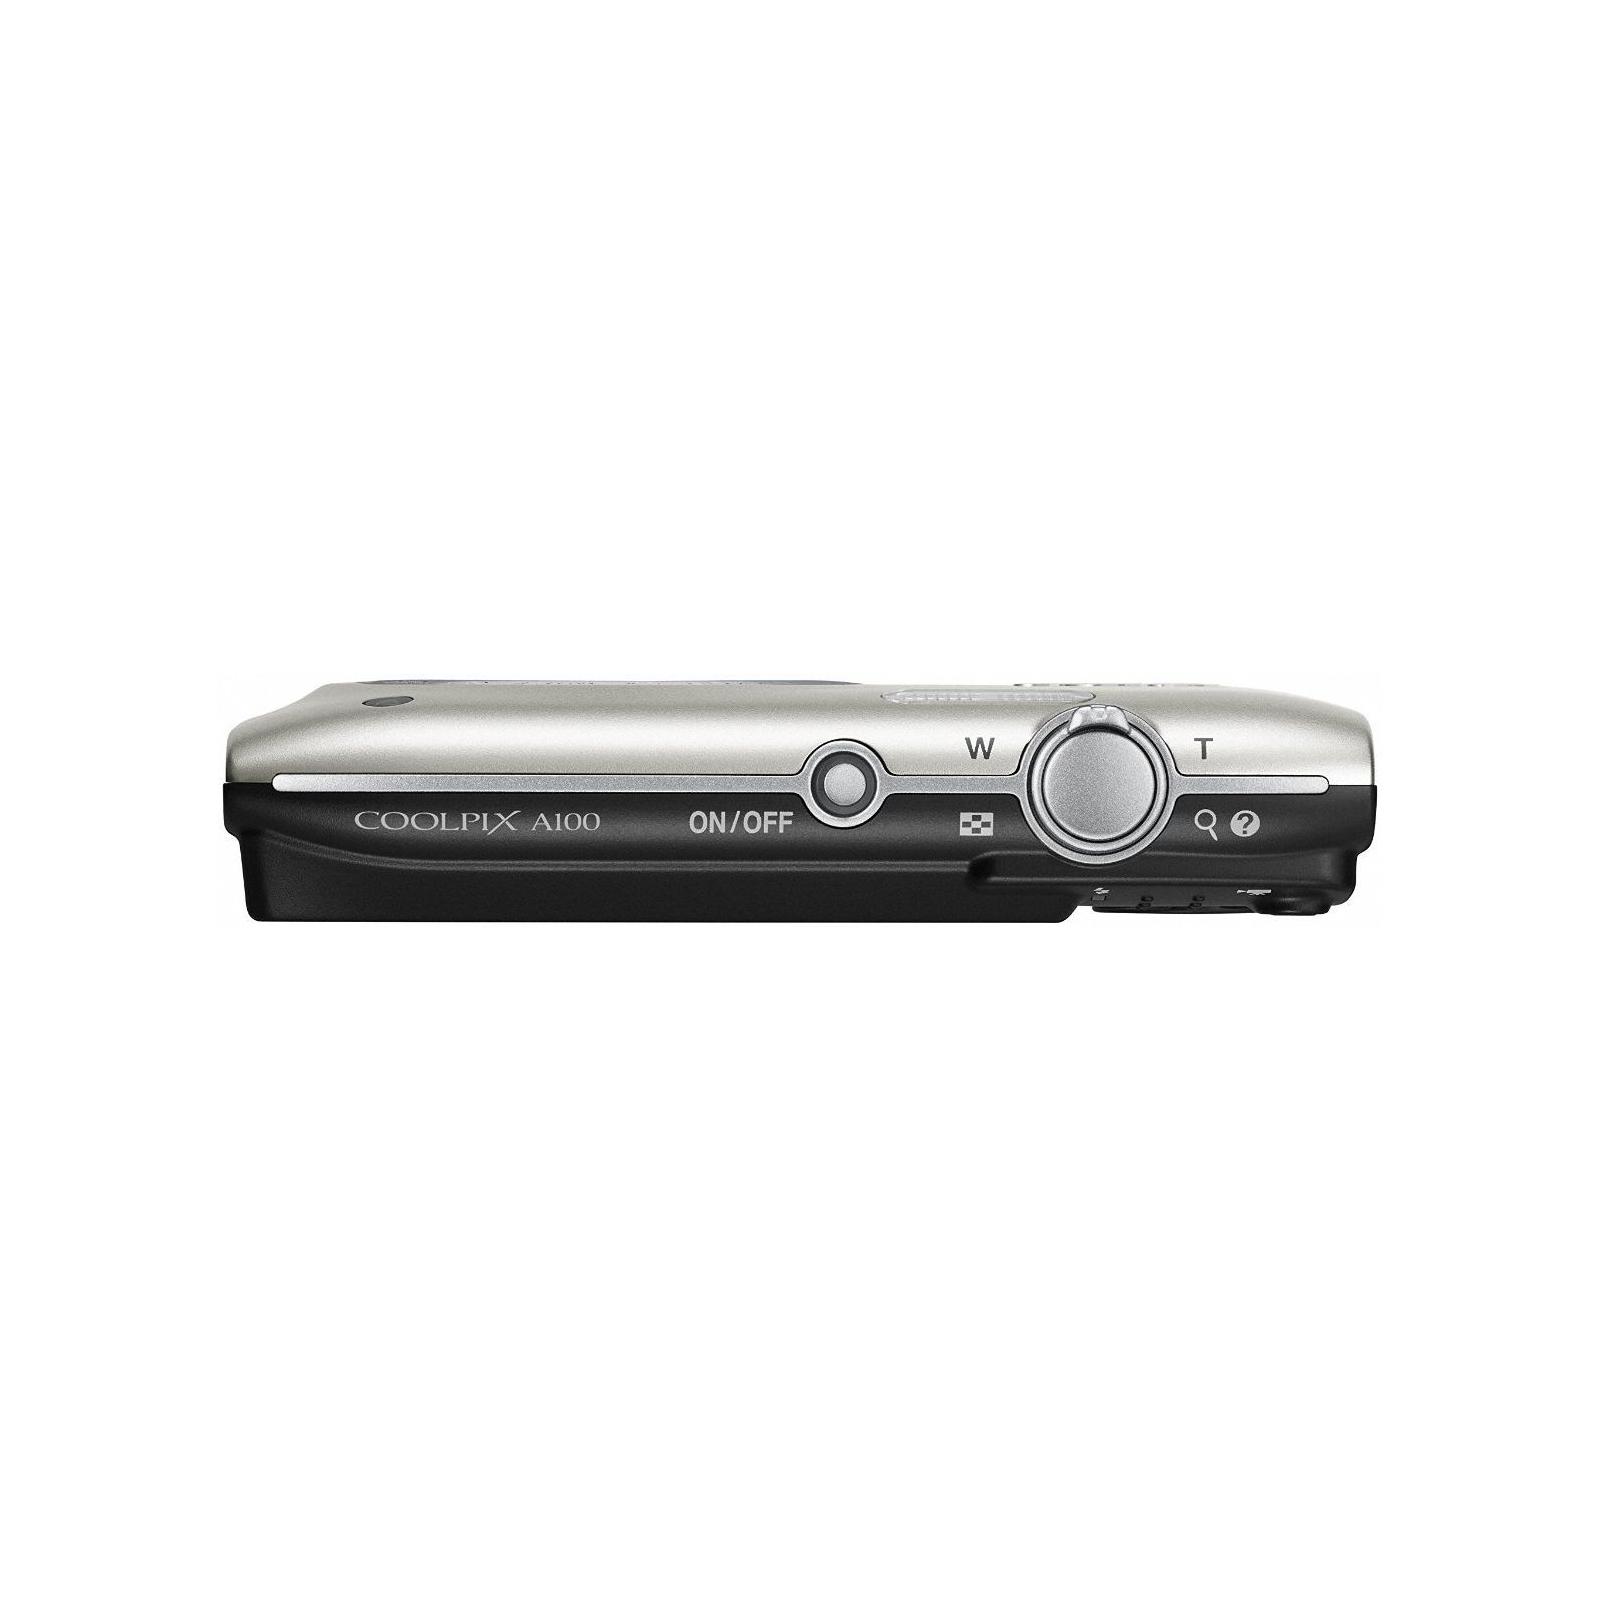 Цифровой фотоаппарат Nikon Coolpix A100 Silver (VNA970E1) изображение 4